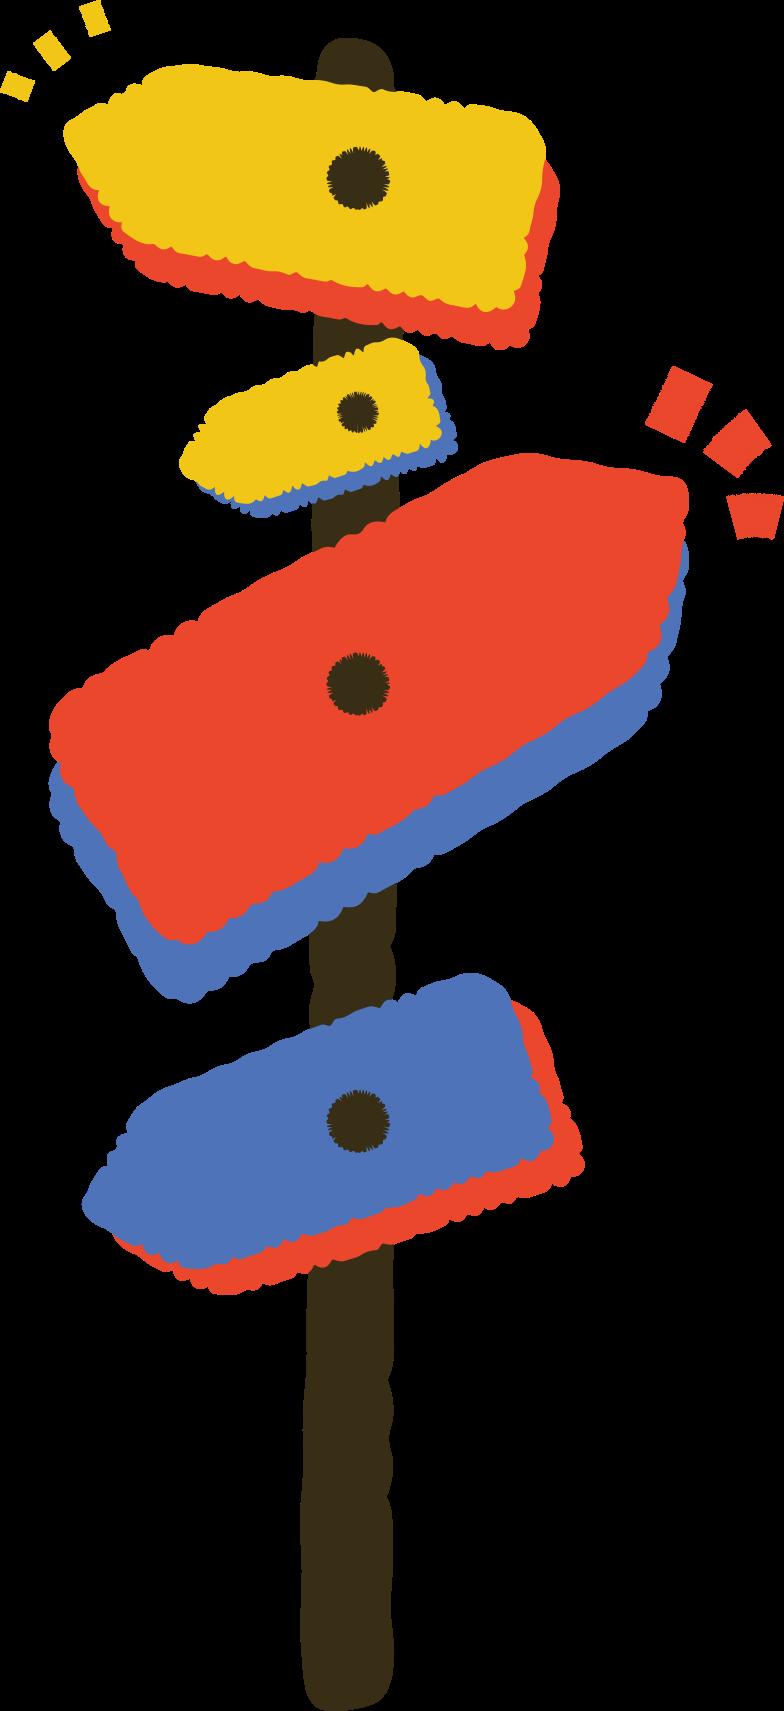 signpost Clipart illustration in PNG, SVG